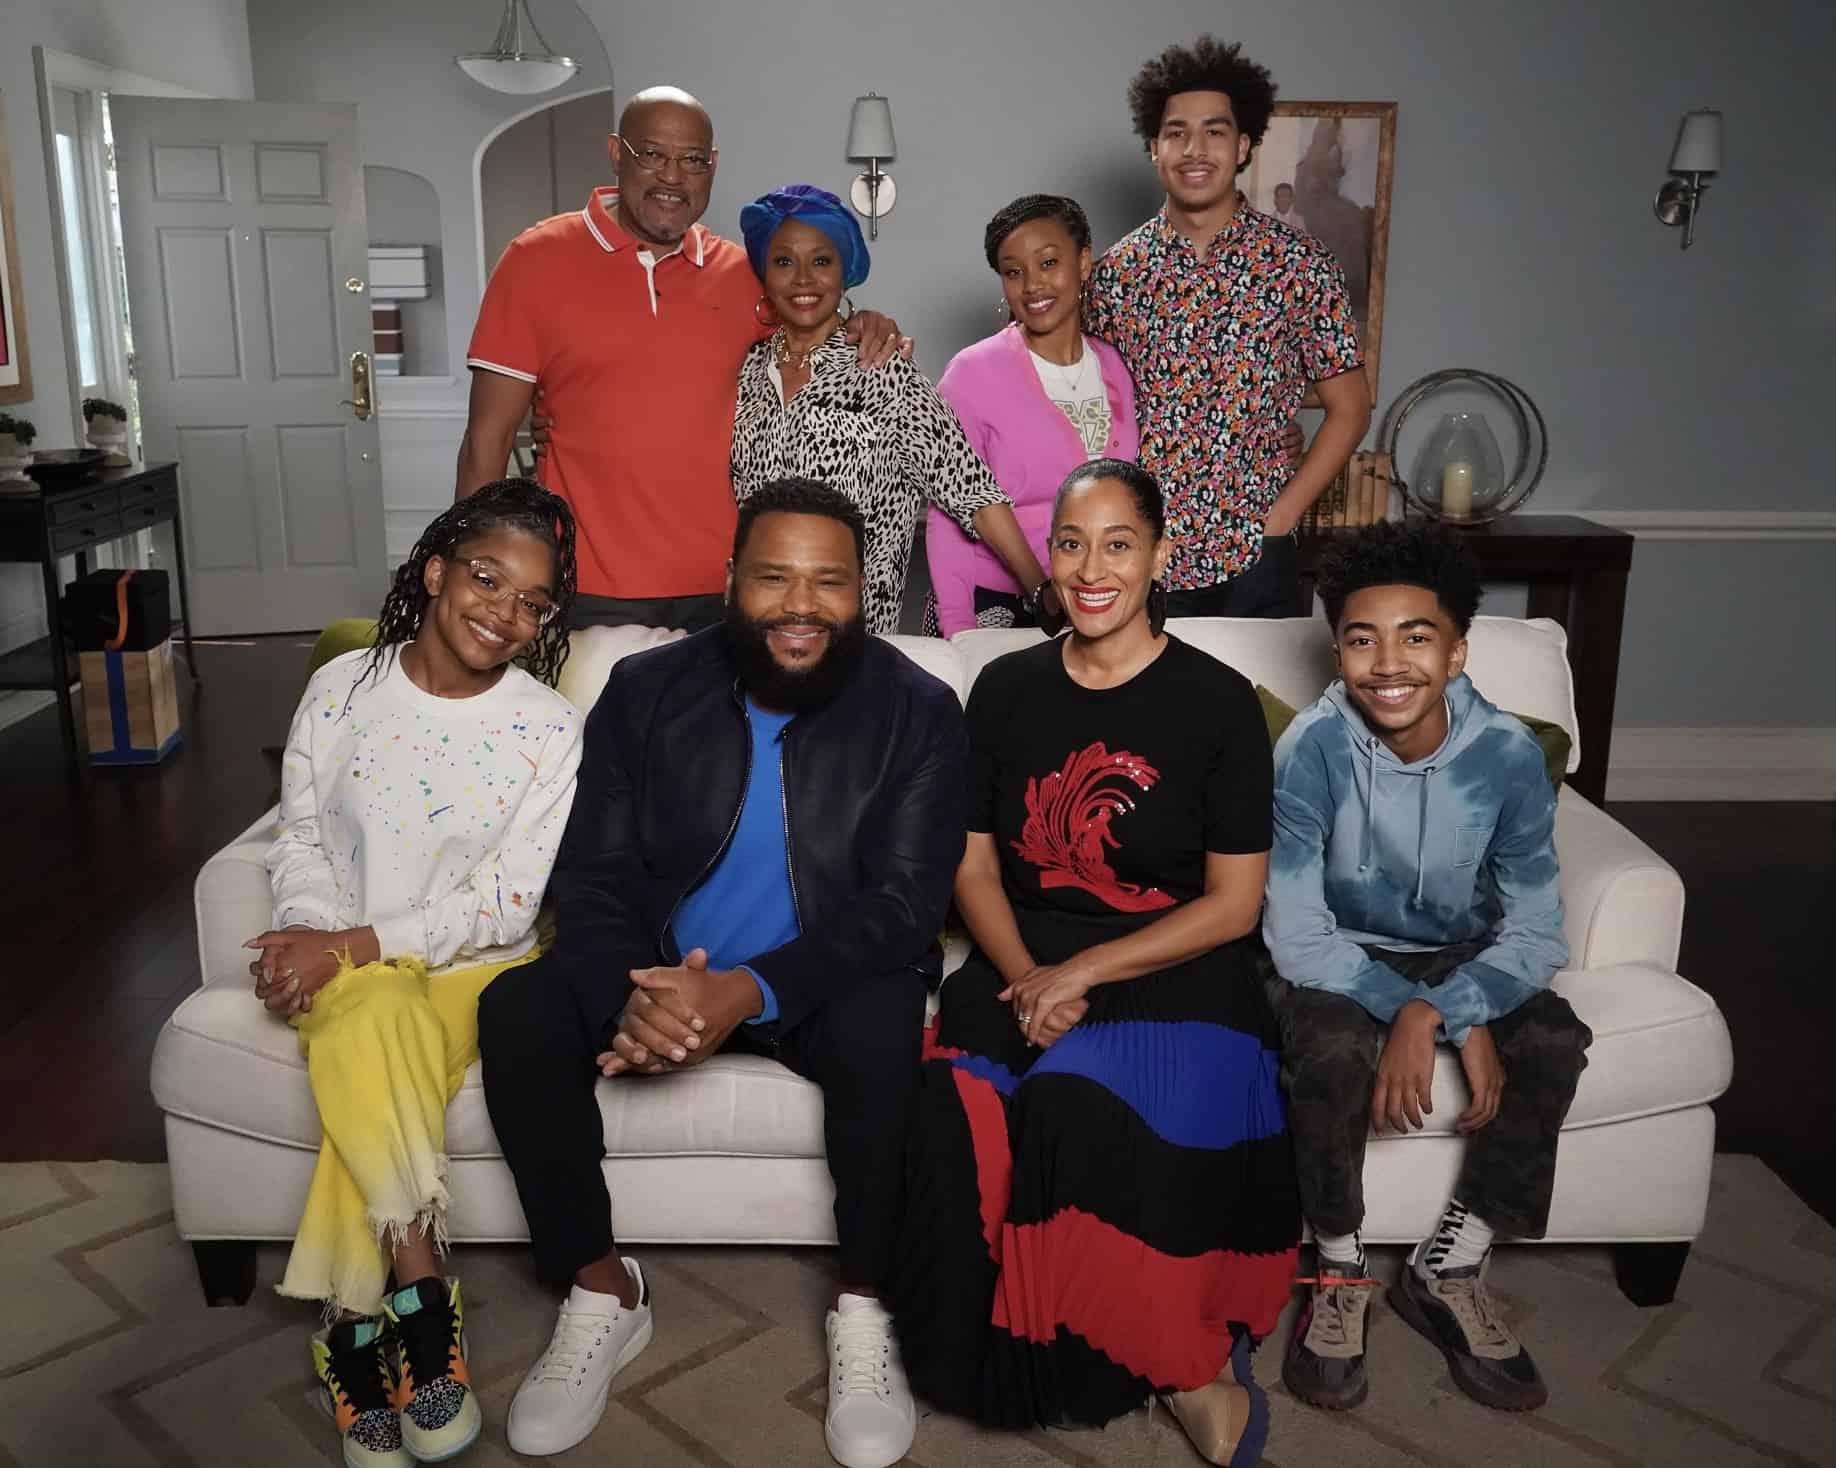 BLACK-ISH Season 7 Episode 21 Photos Urban Legend